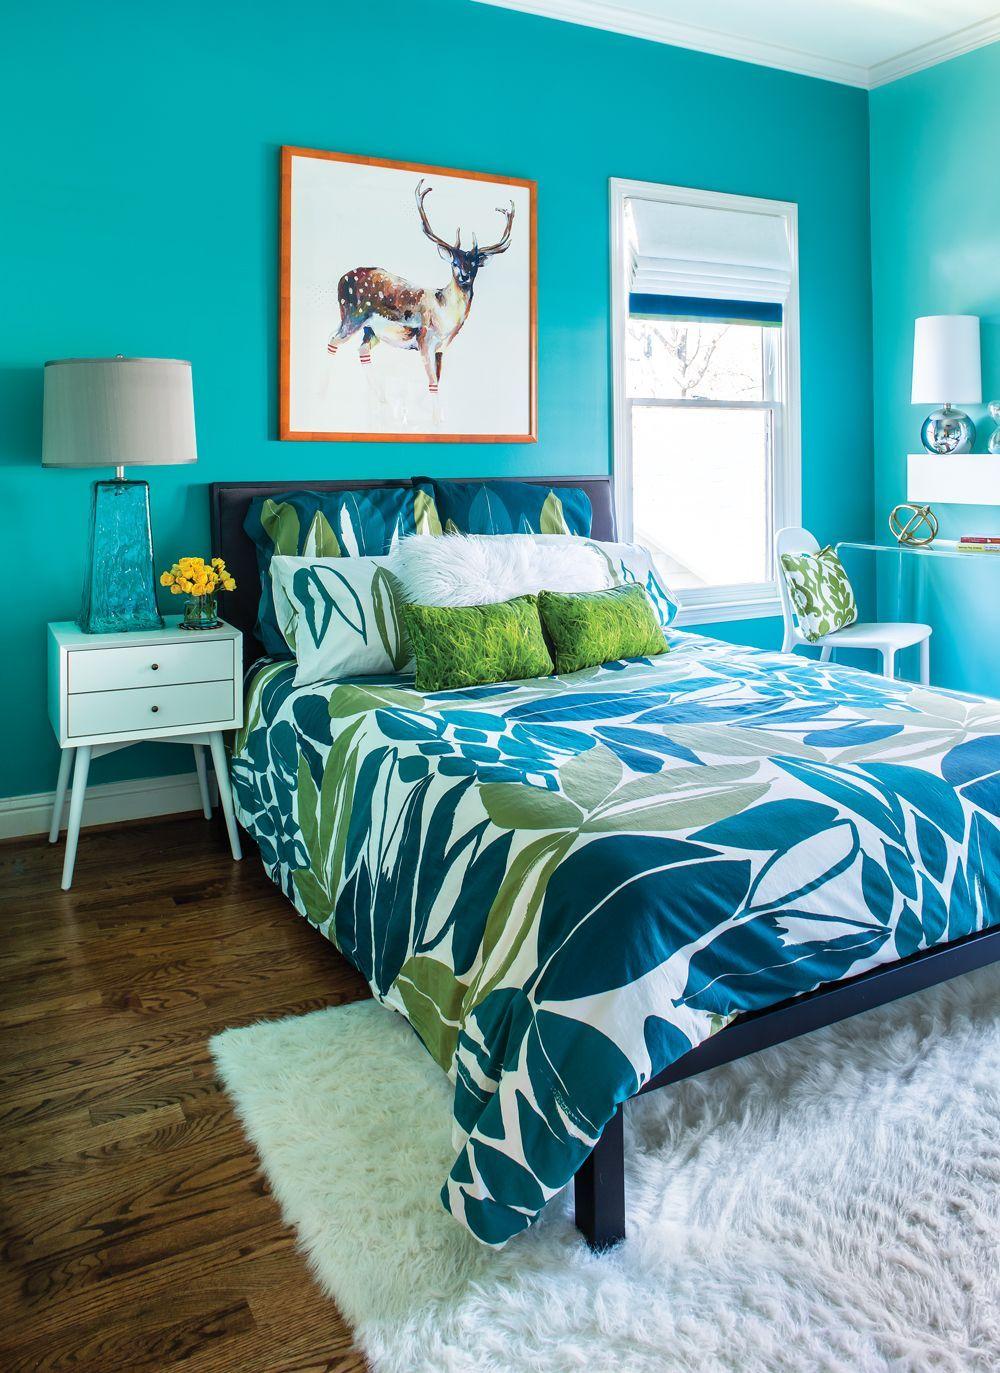 Bedroom Idea For Farmhouse Bedroom Green Bedroom Decor Bedroom Inspirations